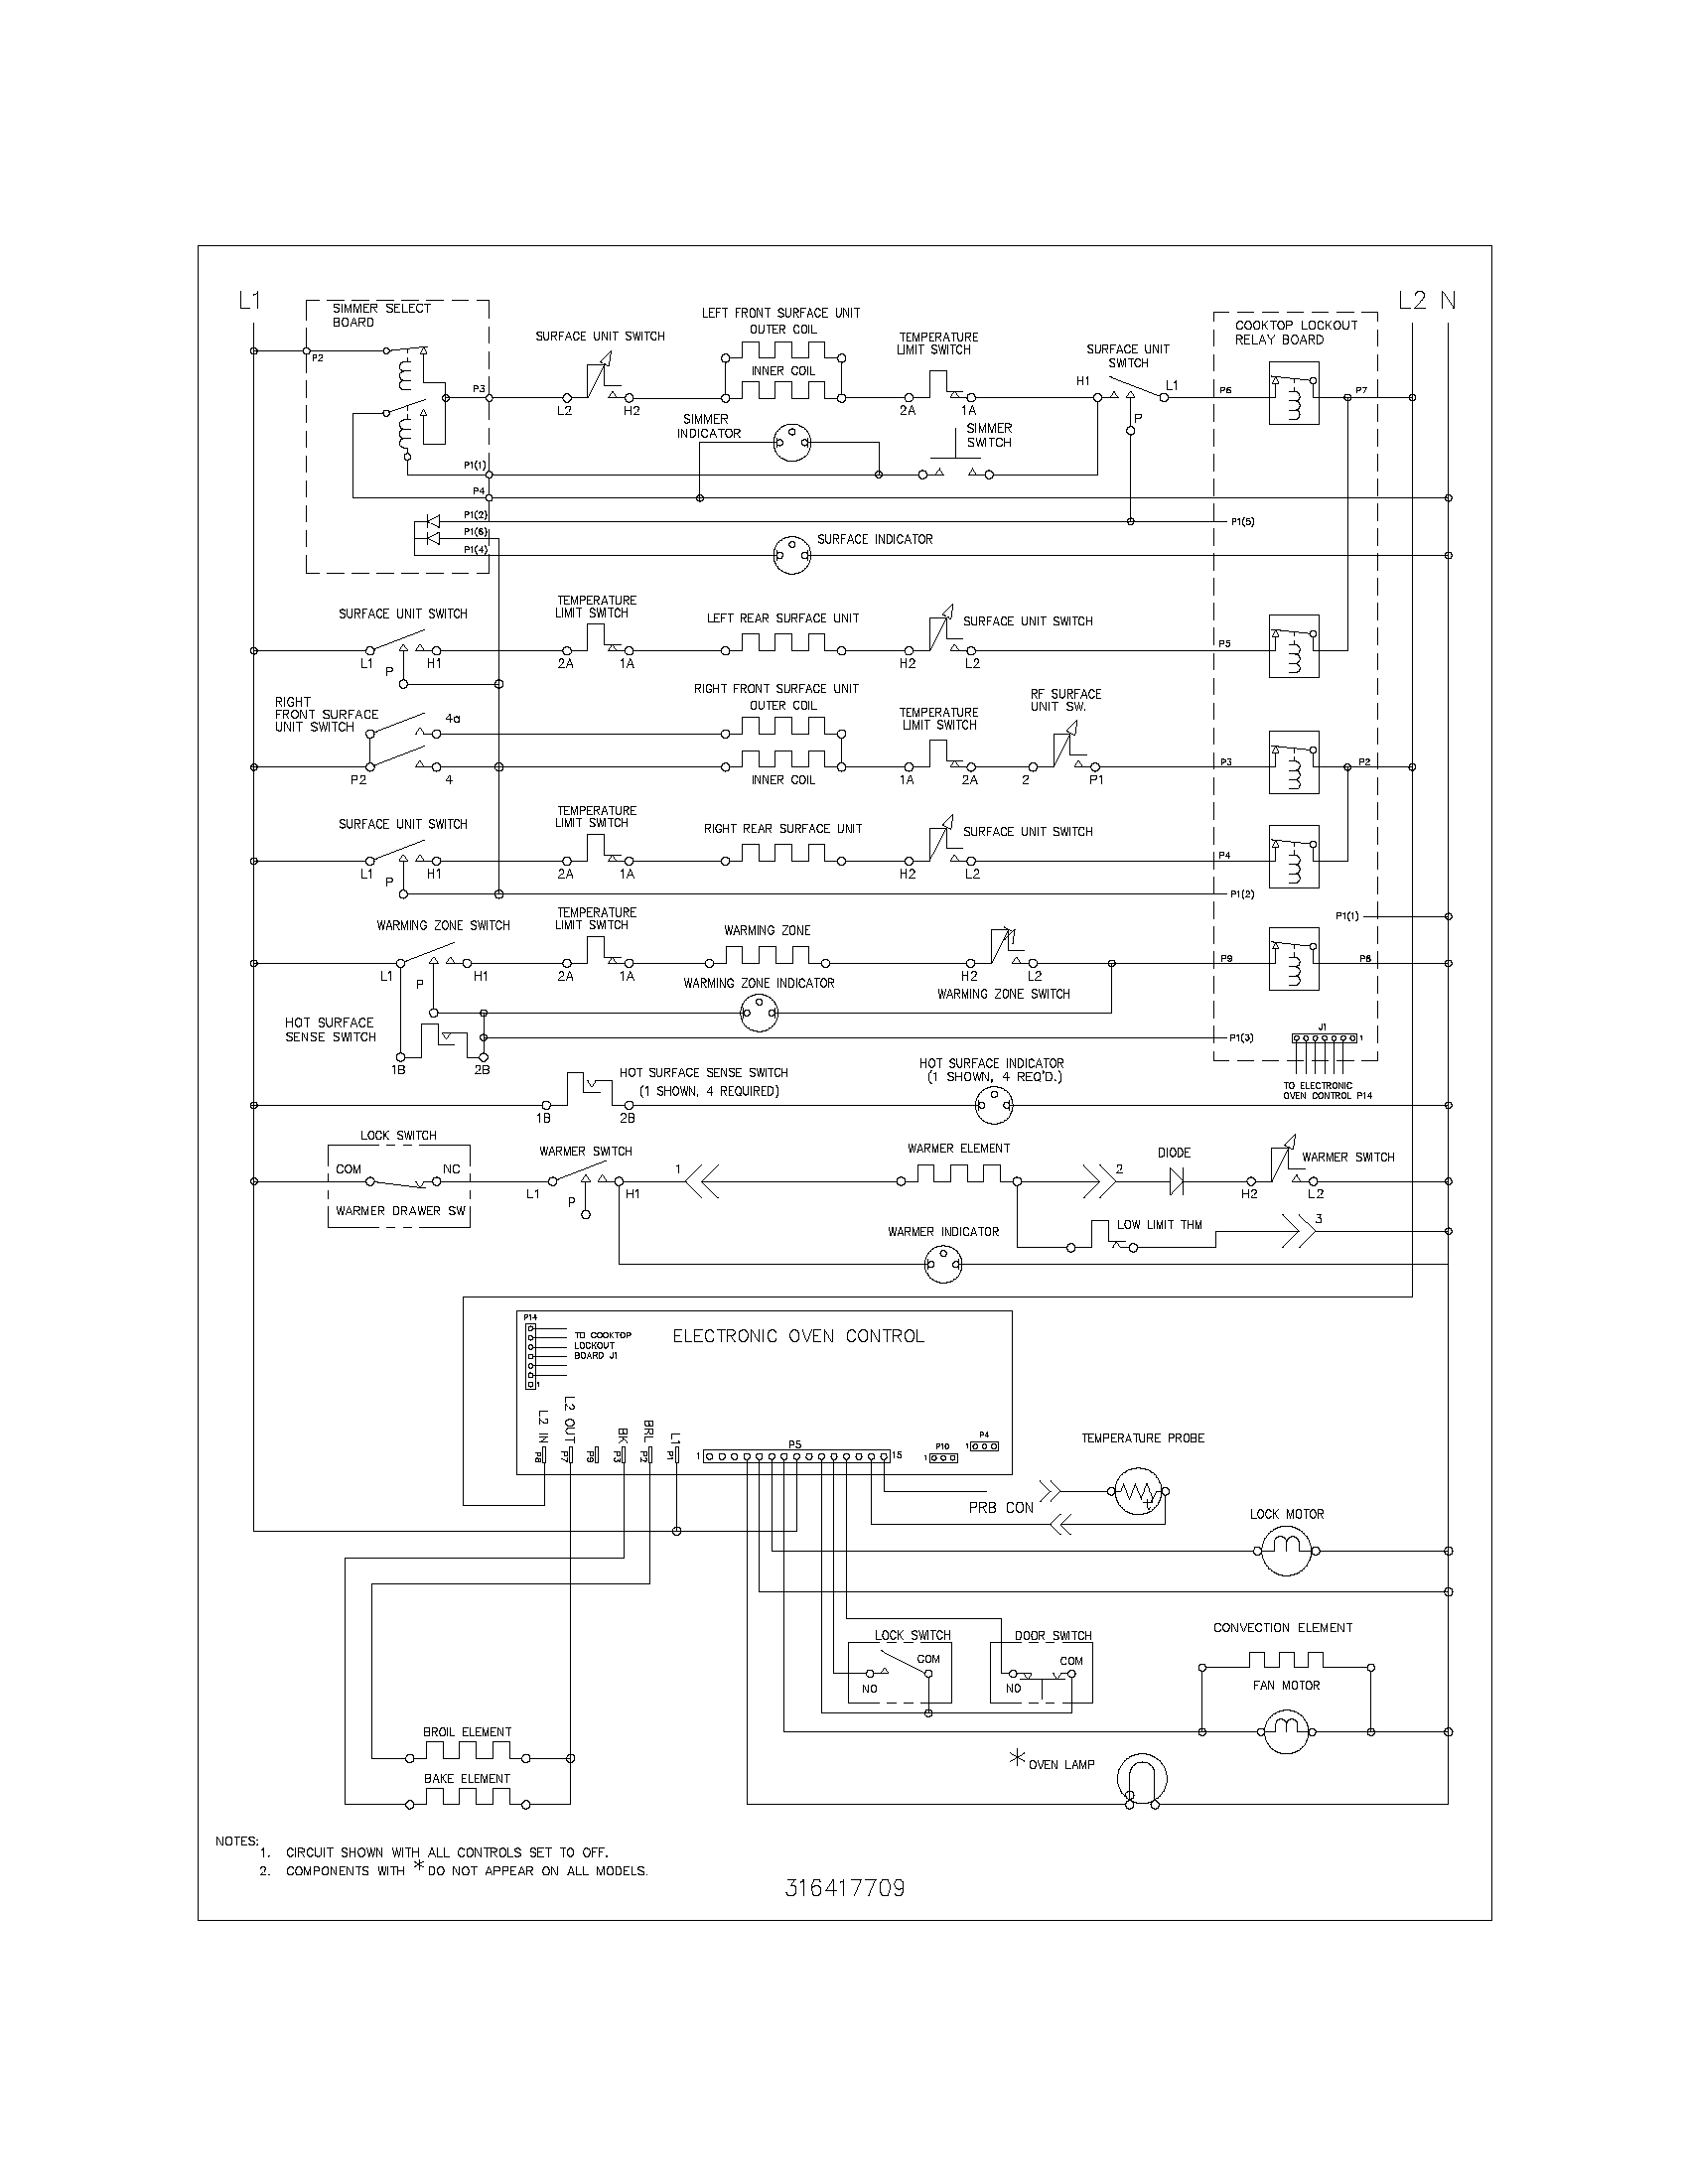 Milnor Wiring Diagrams Reveolution Of Diagram Residential Schematic Hd Wallpapers Dryer Www 3836 Ga Rh Automotive Hvac